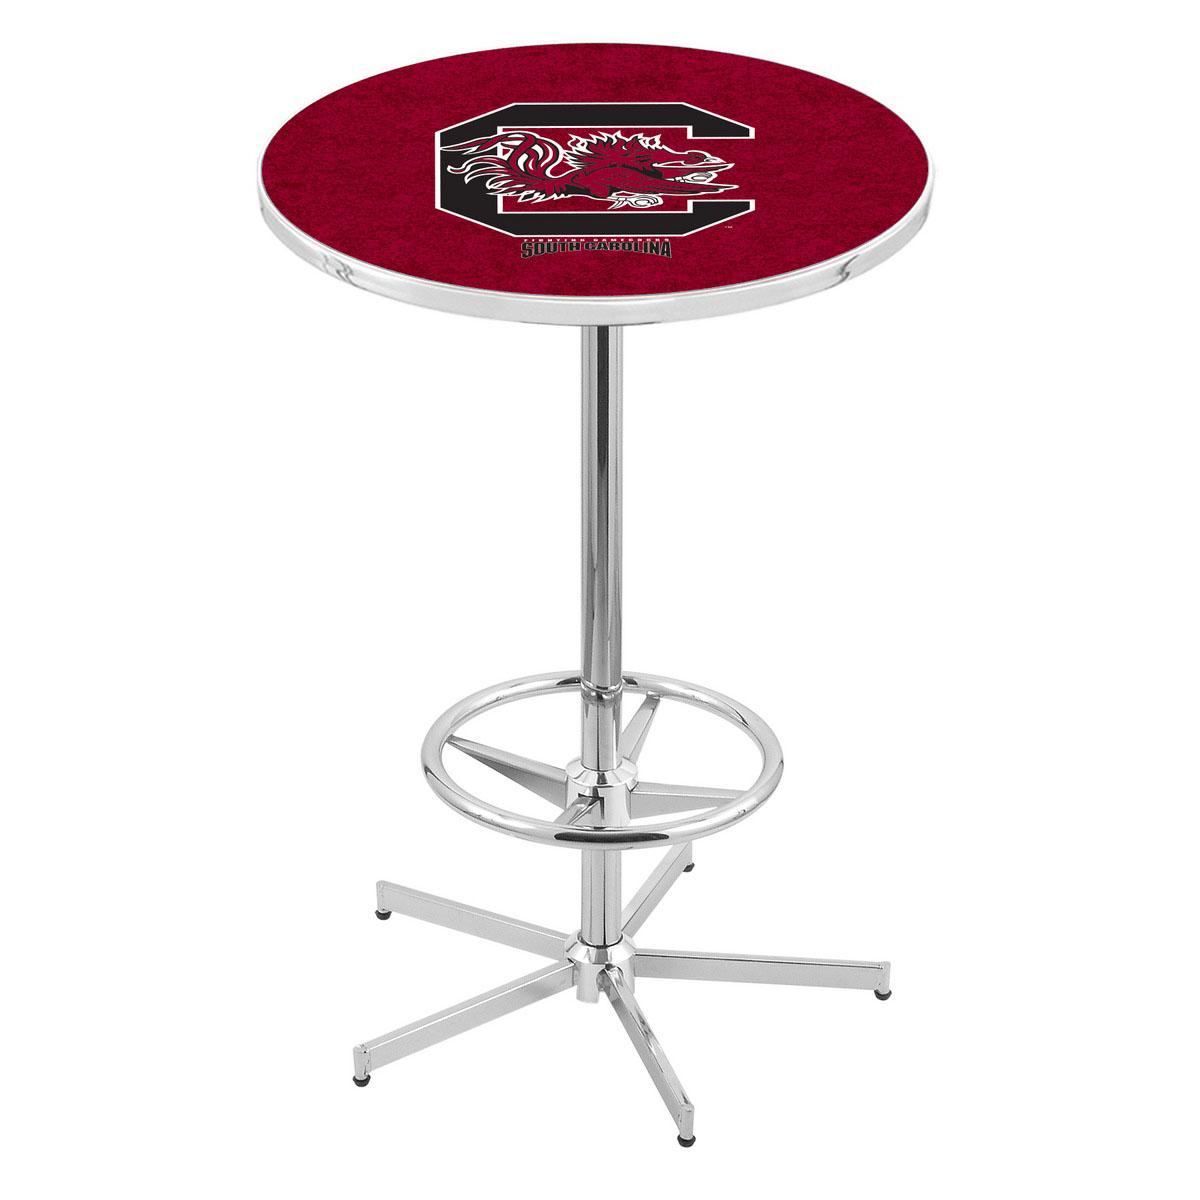 Splendid Chrome South Carolina Pub Table Product Photo